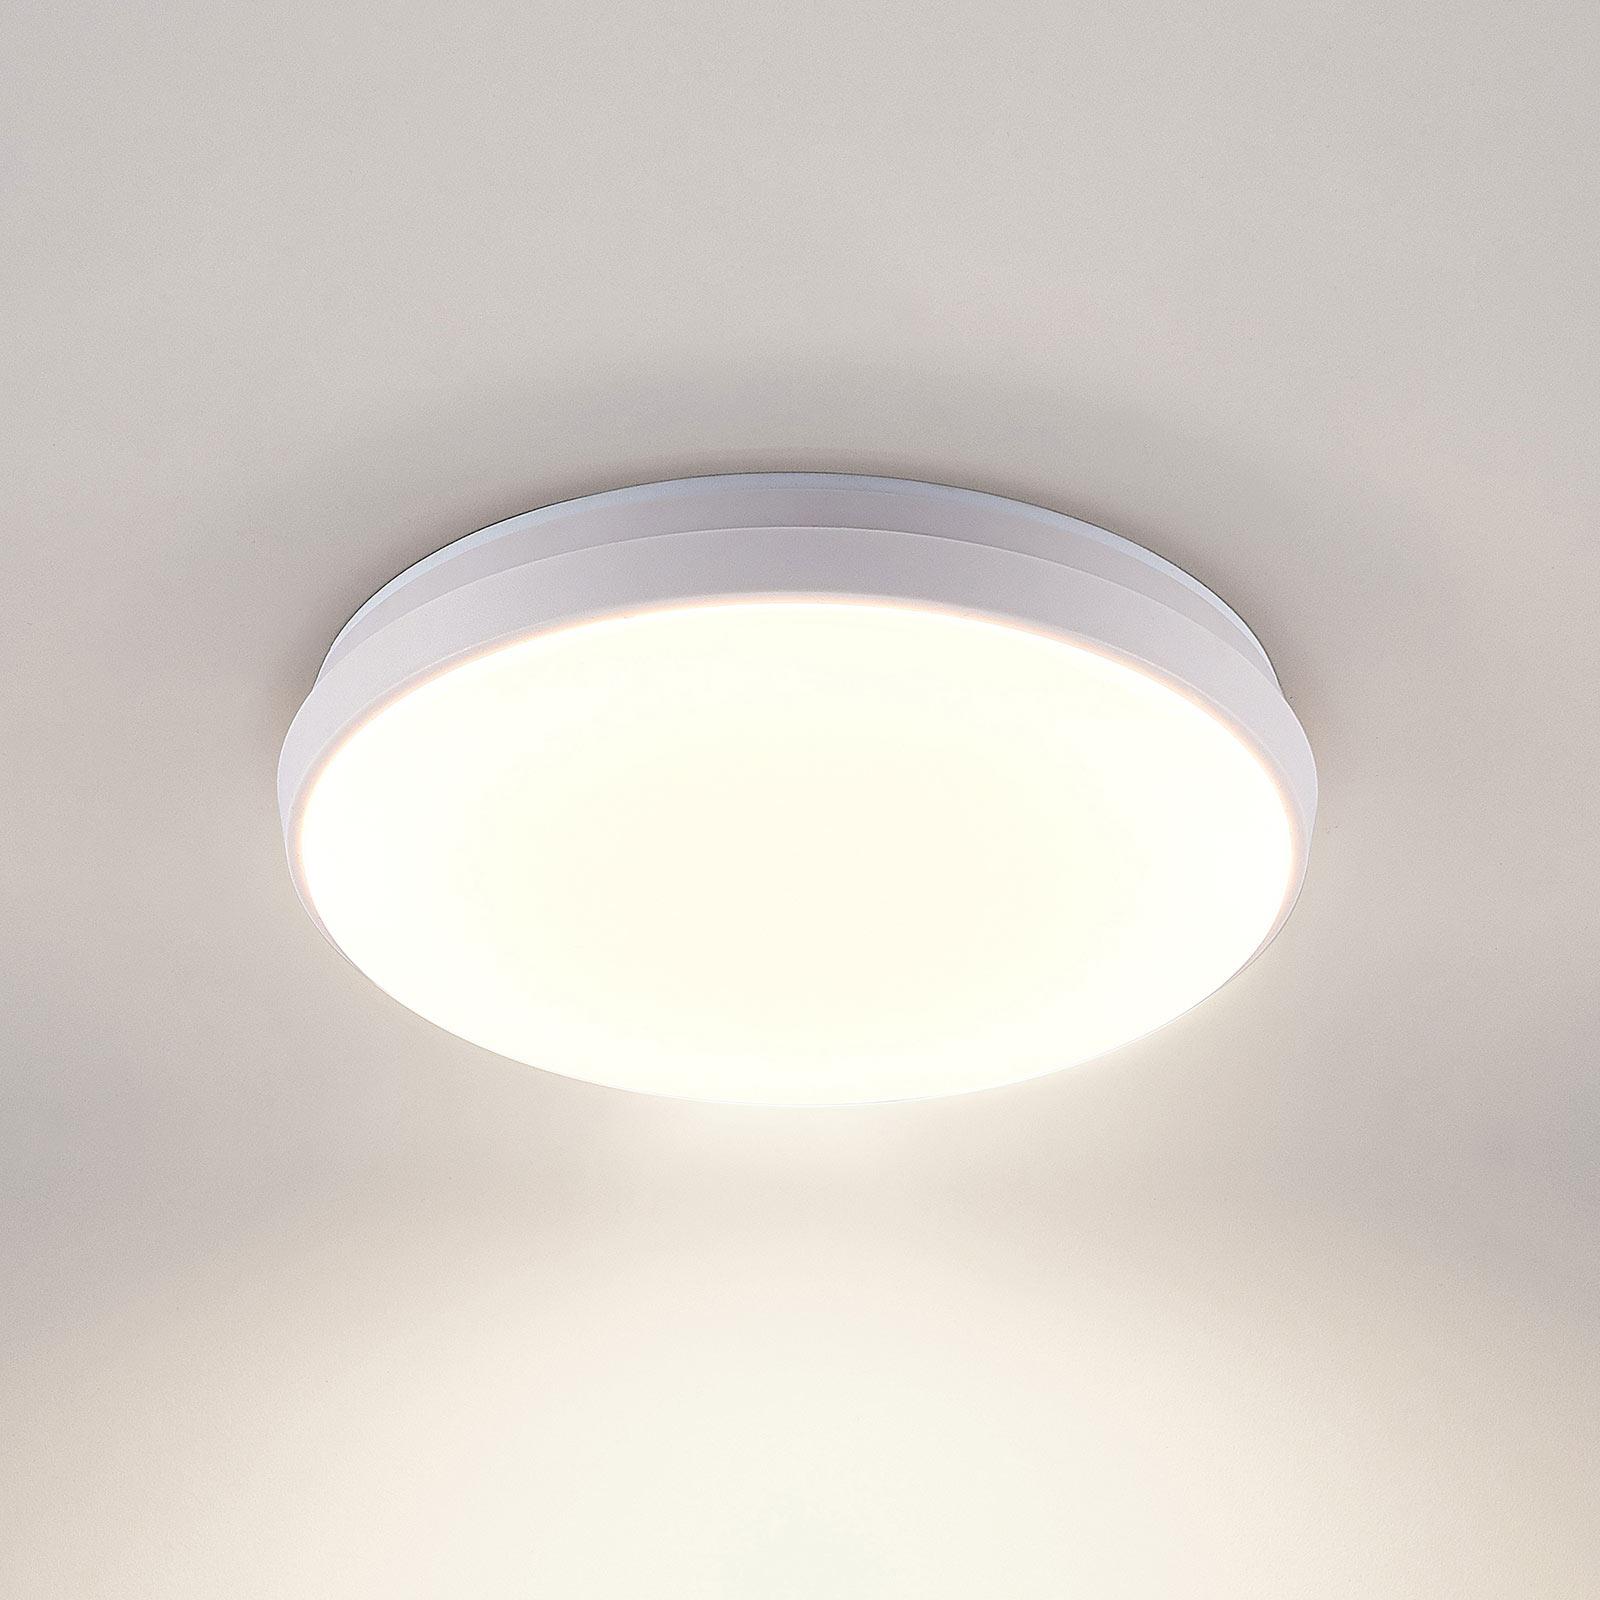 Arcchio Brady LED-loftlampe, hvid, rund, 25 cm